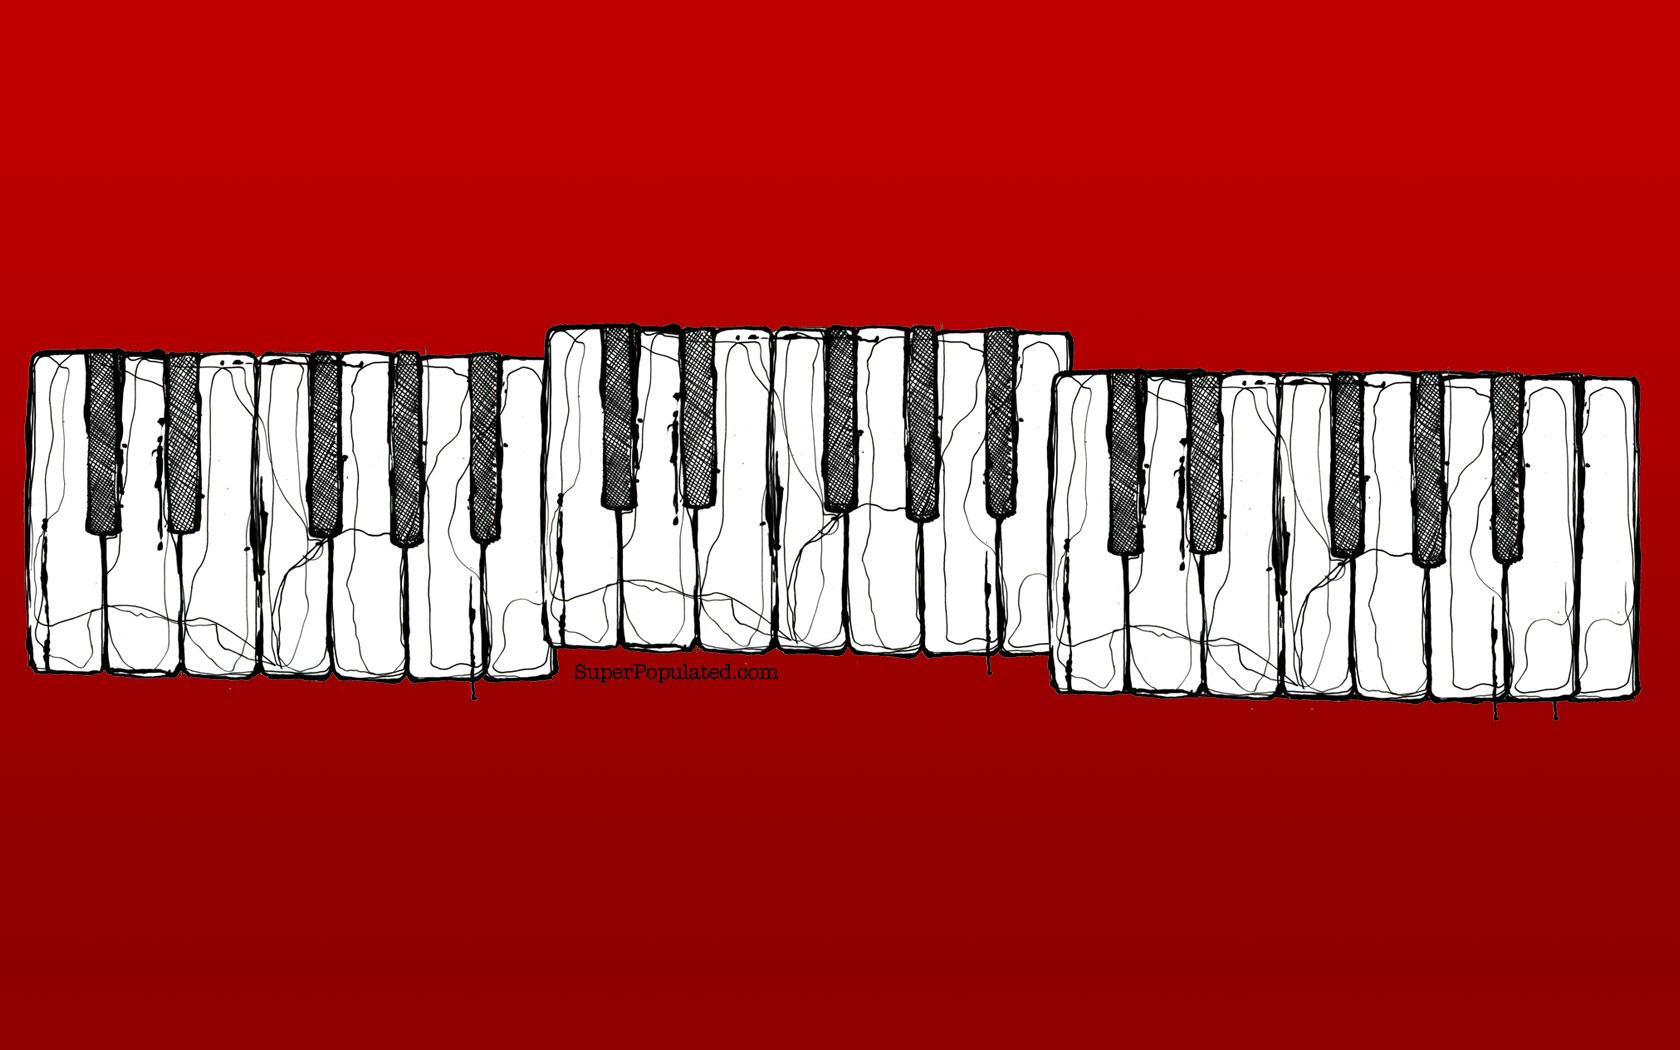 76+] Piano Keys Wallpaper on WallpaperSafari